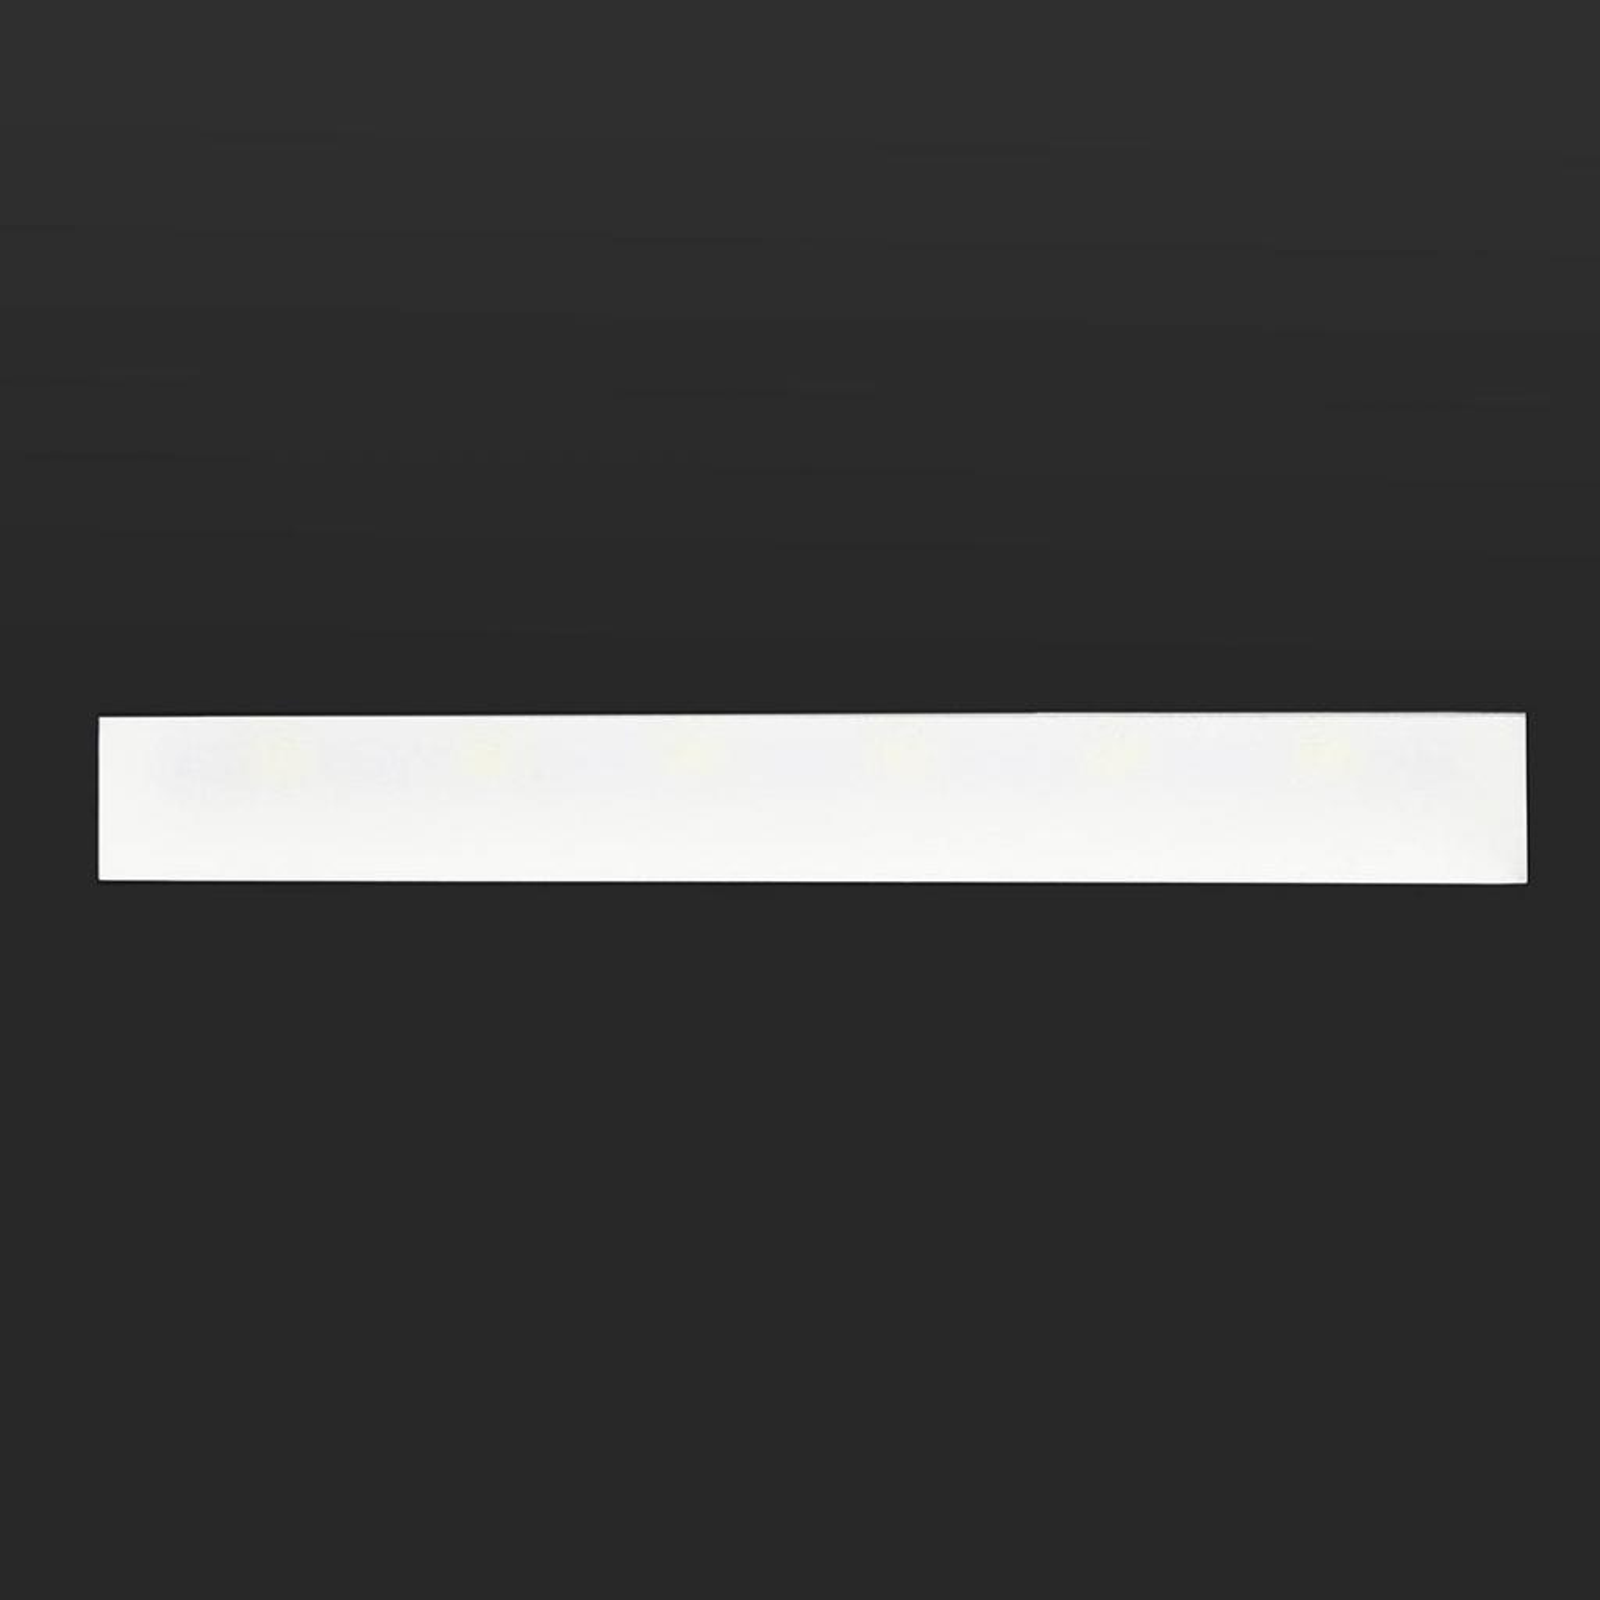 Вытяжка кухонная PERFELLI TLS 6833 BL LED Strip изображение 7